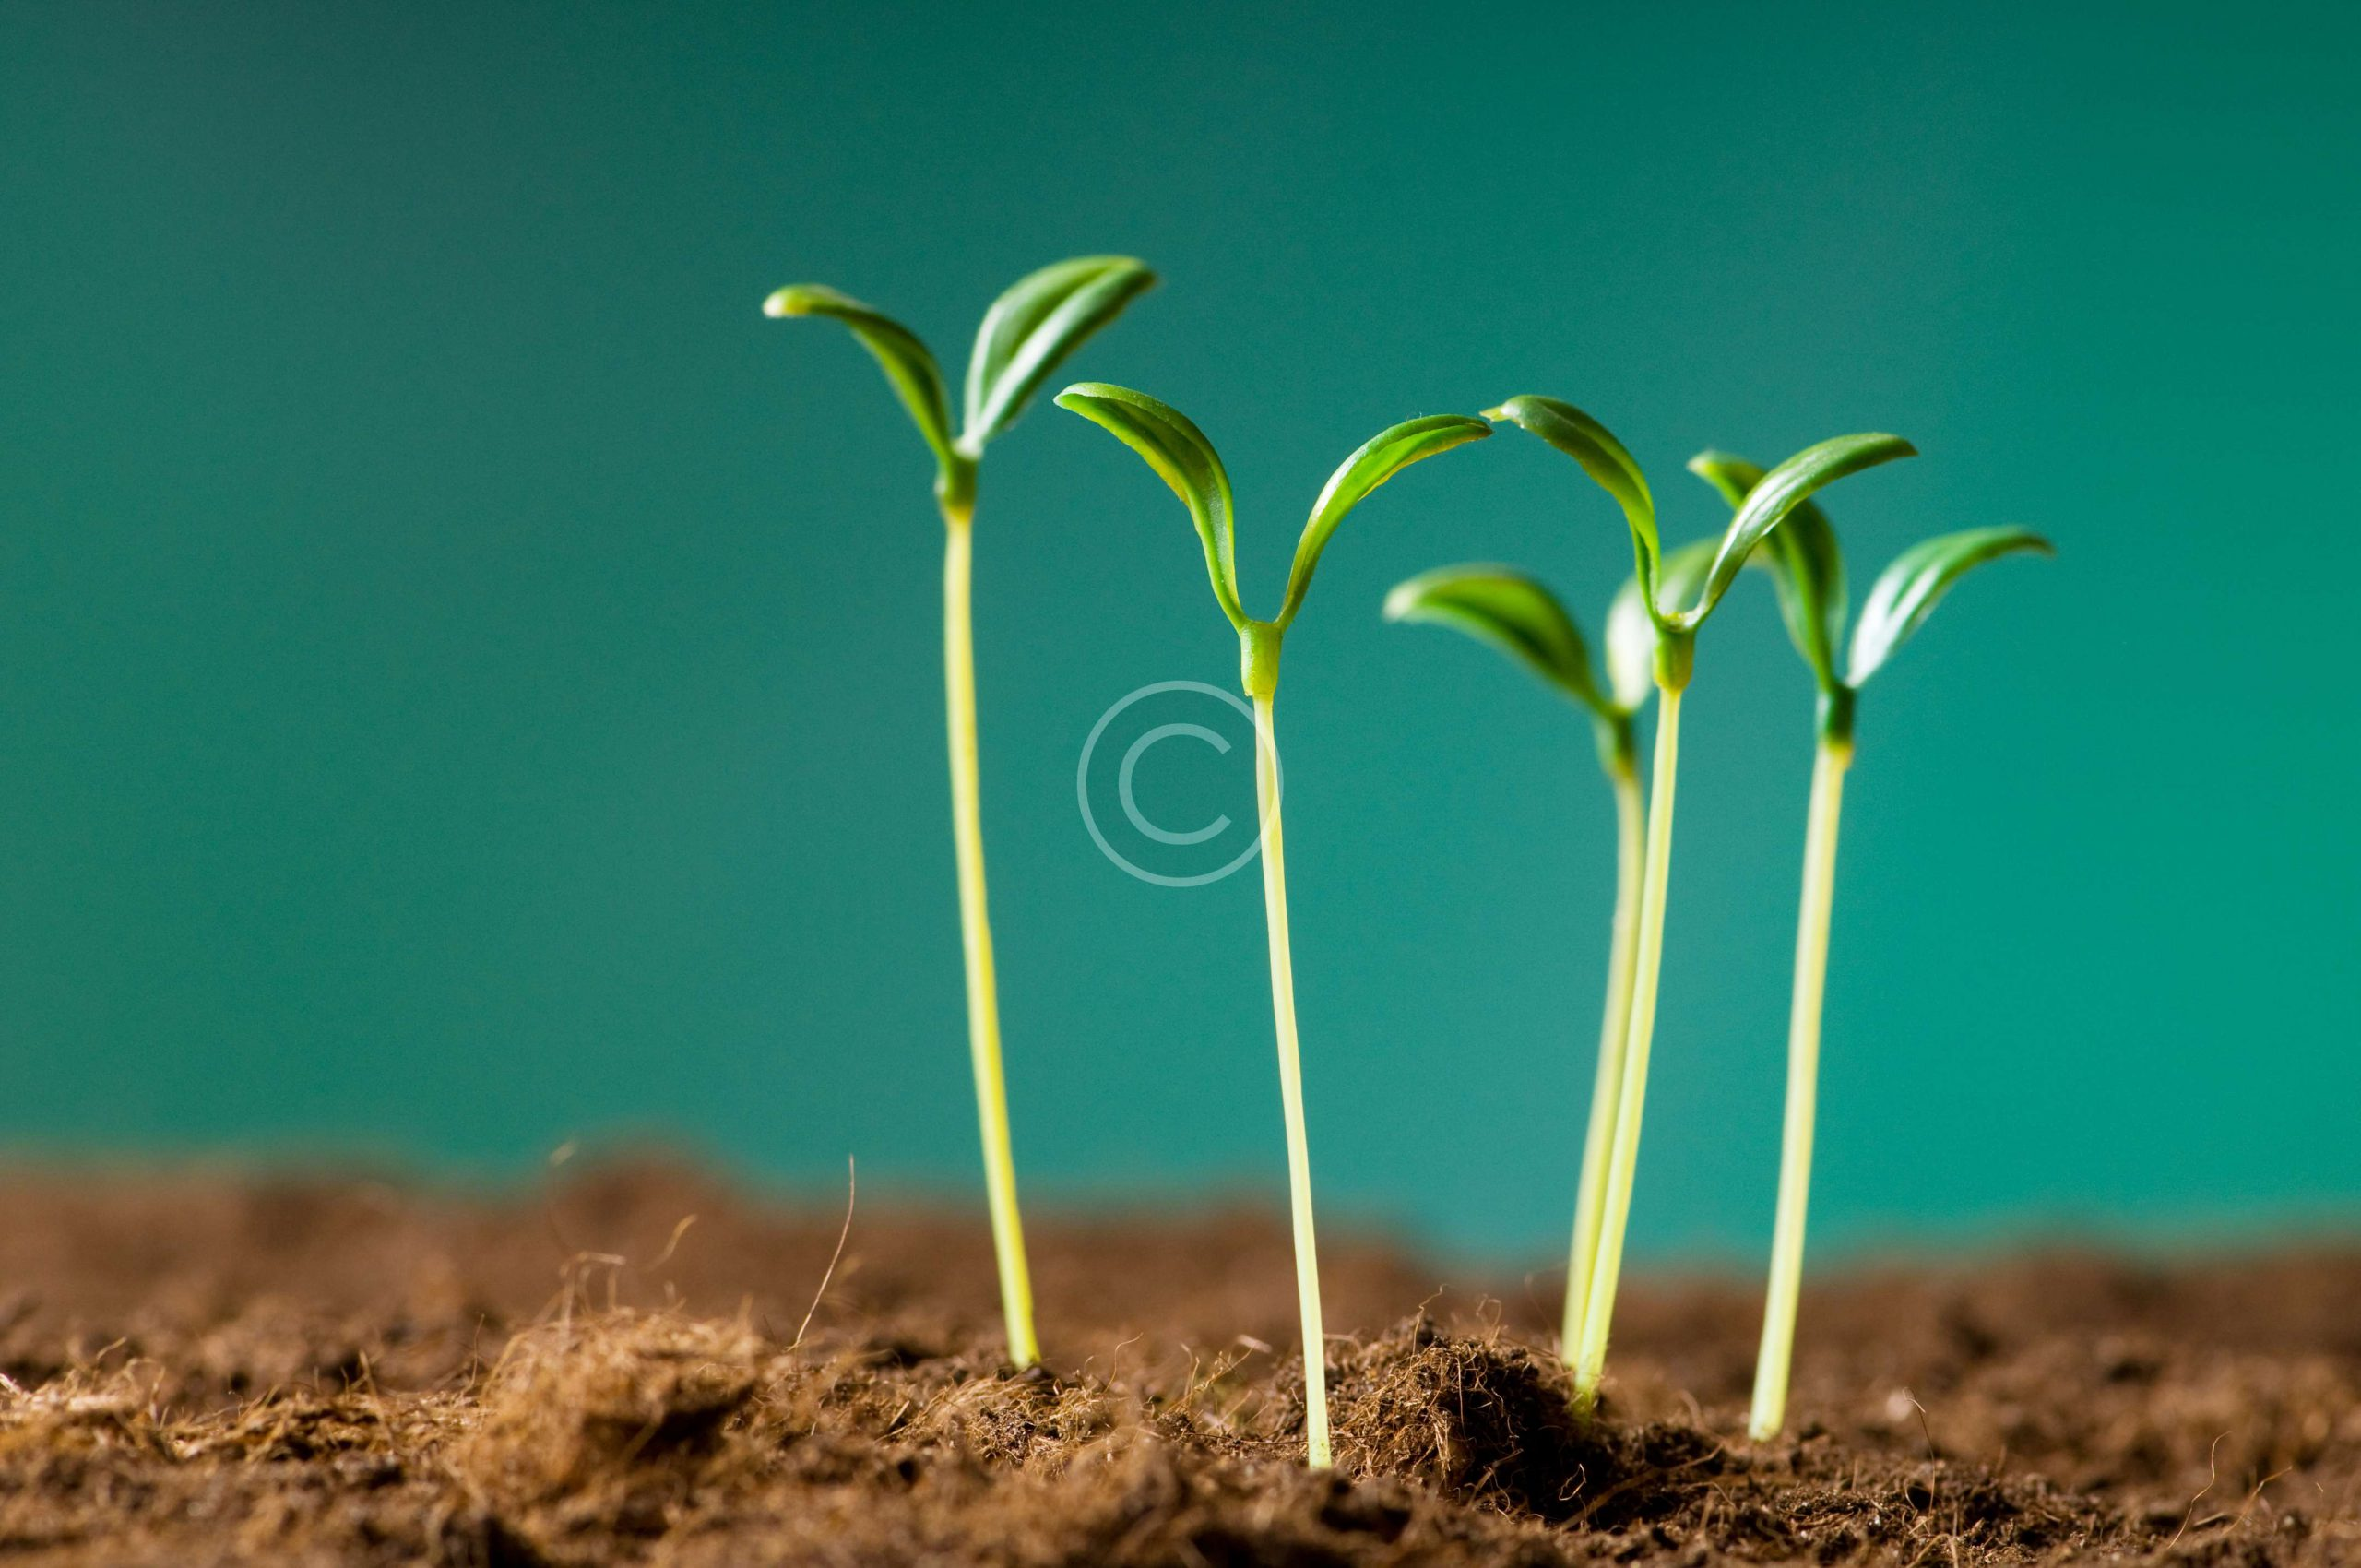 bigstock-Green-seedling-illustrating-co-14319230-scaled